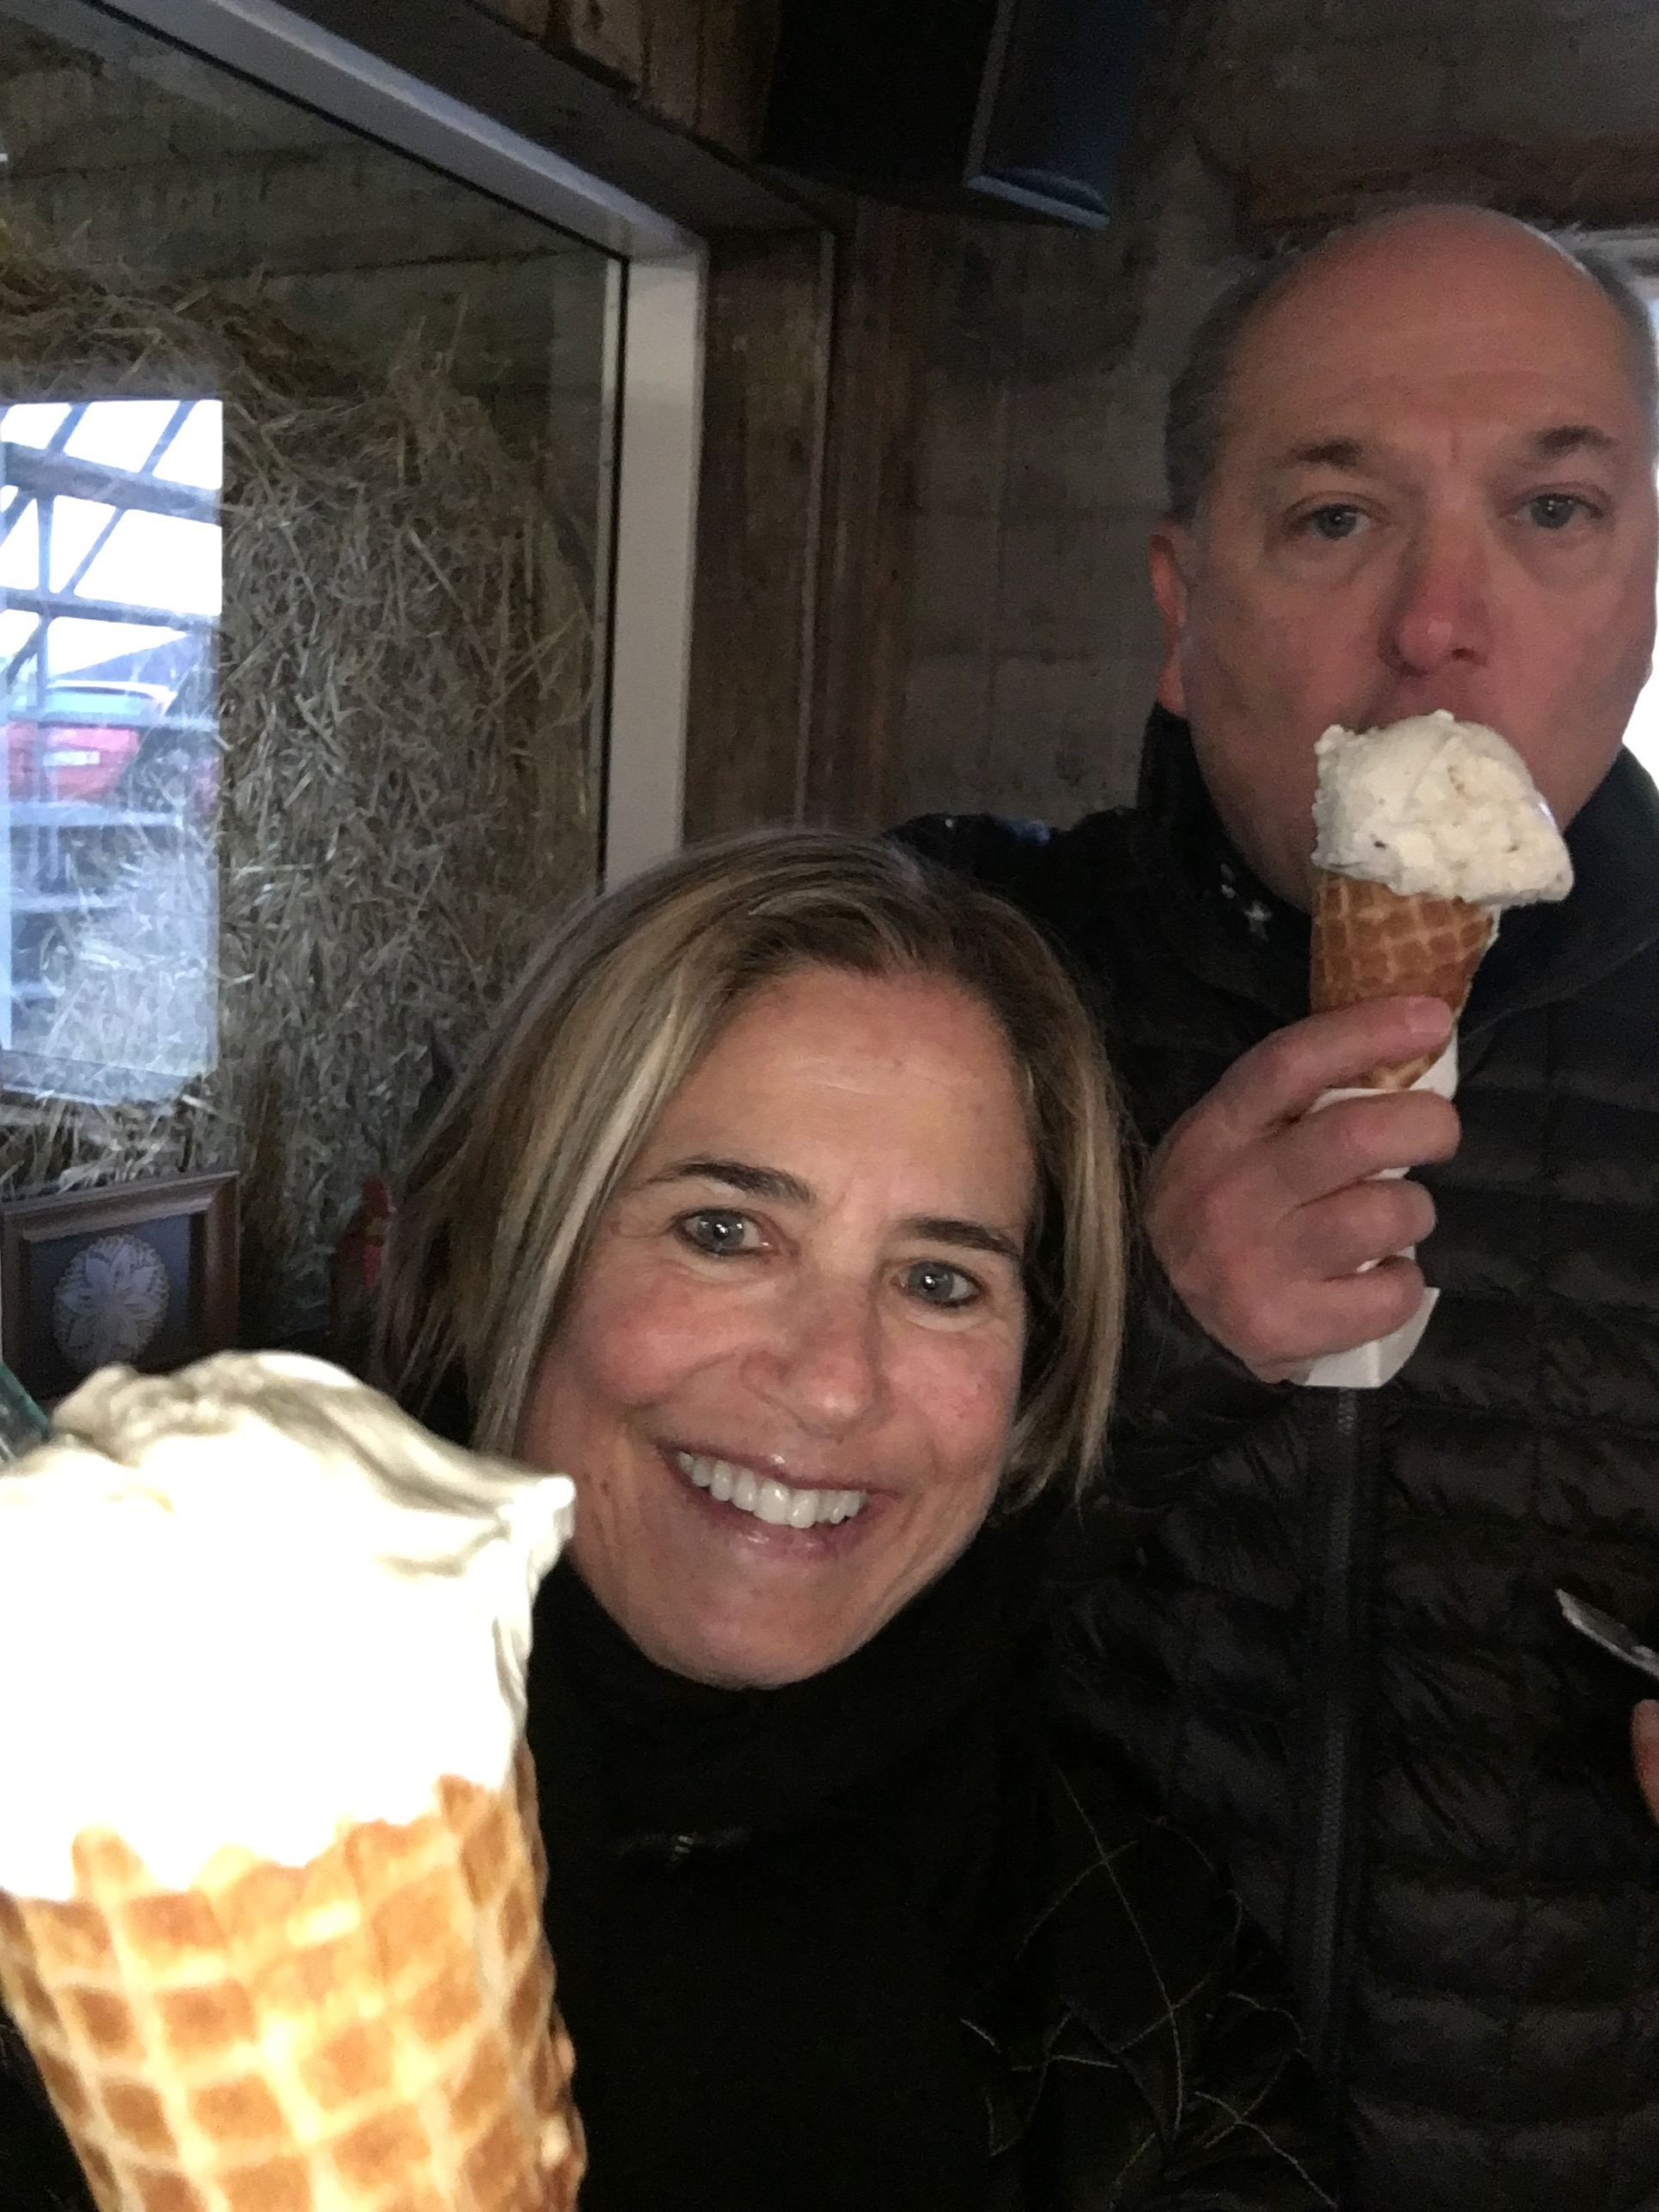 White chocolate ice cream and a handmade waffle cone at  Efstidalur  dairy farm in Bláskógabyggð